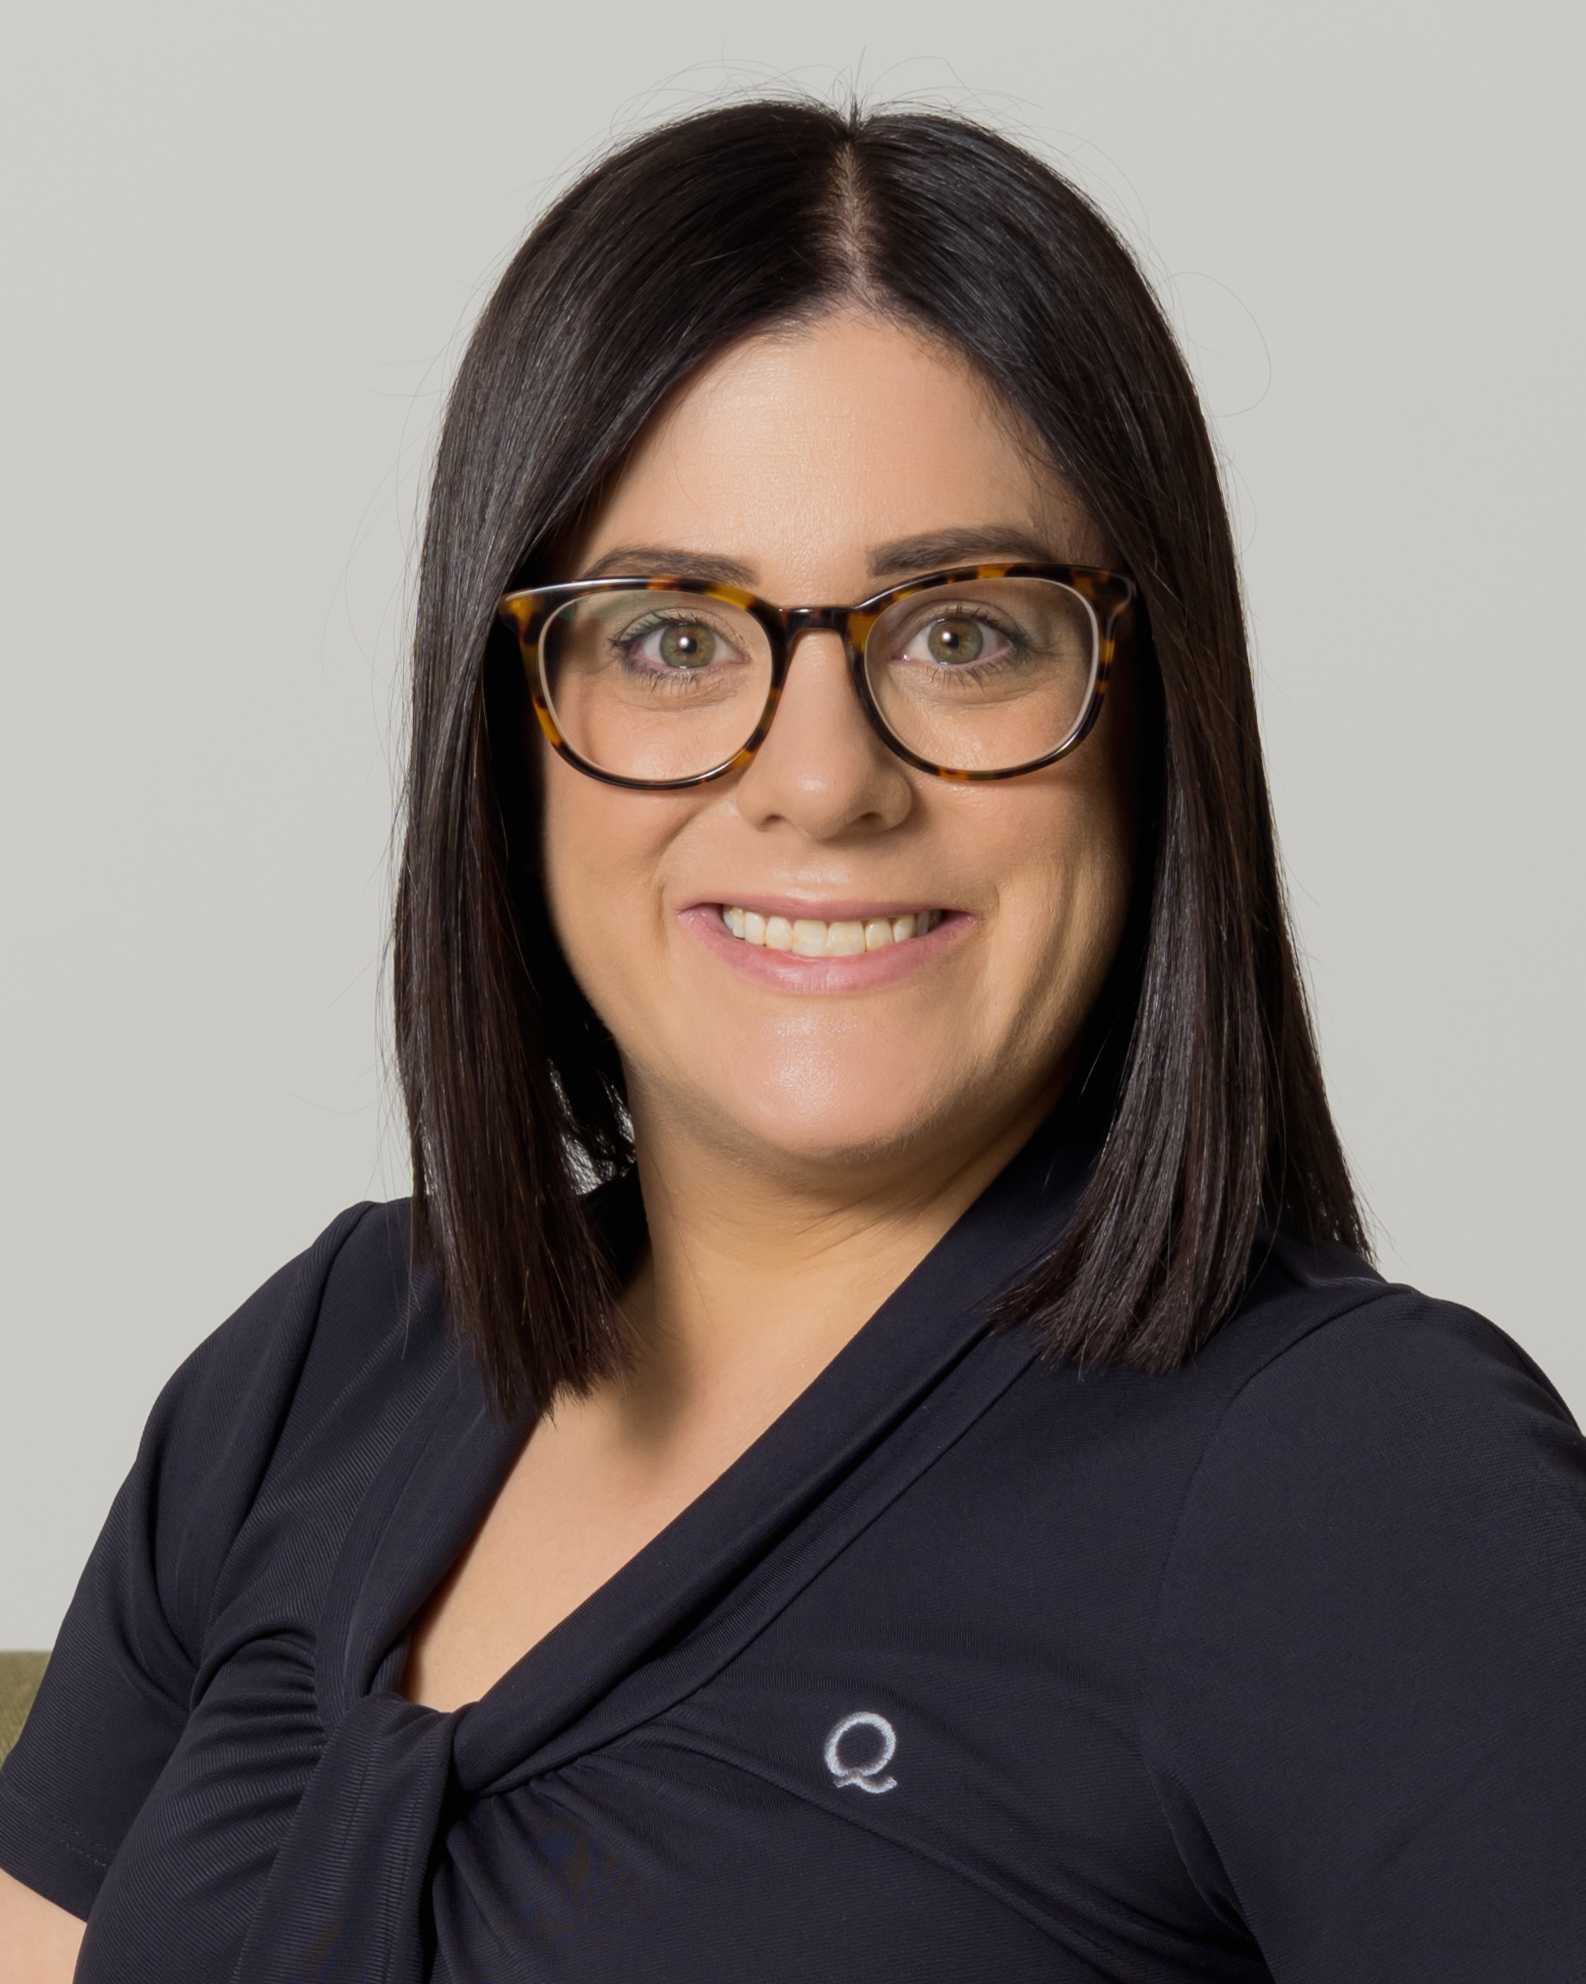 Kate Pitisano